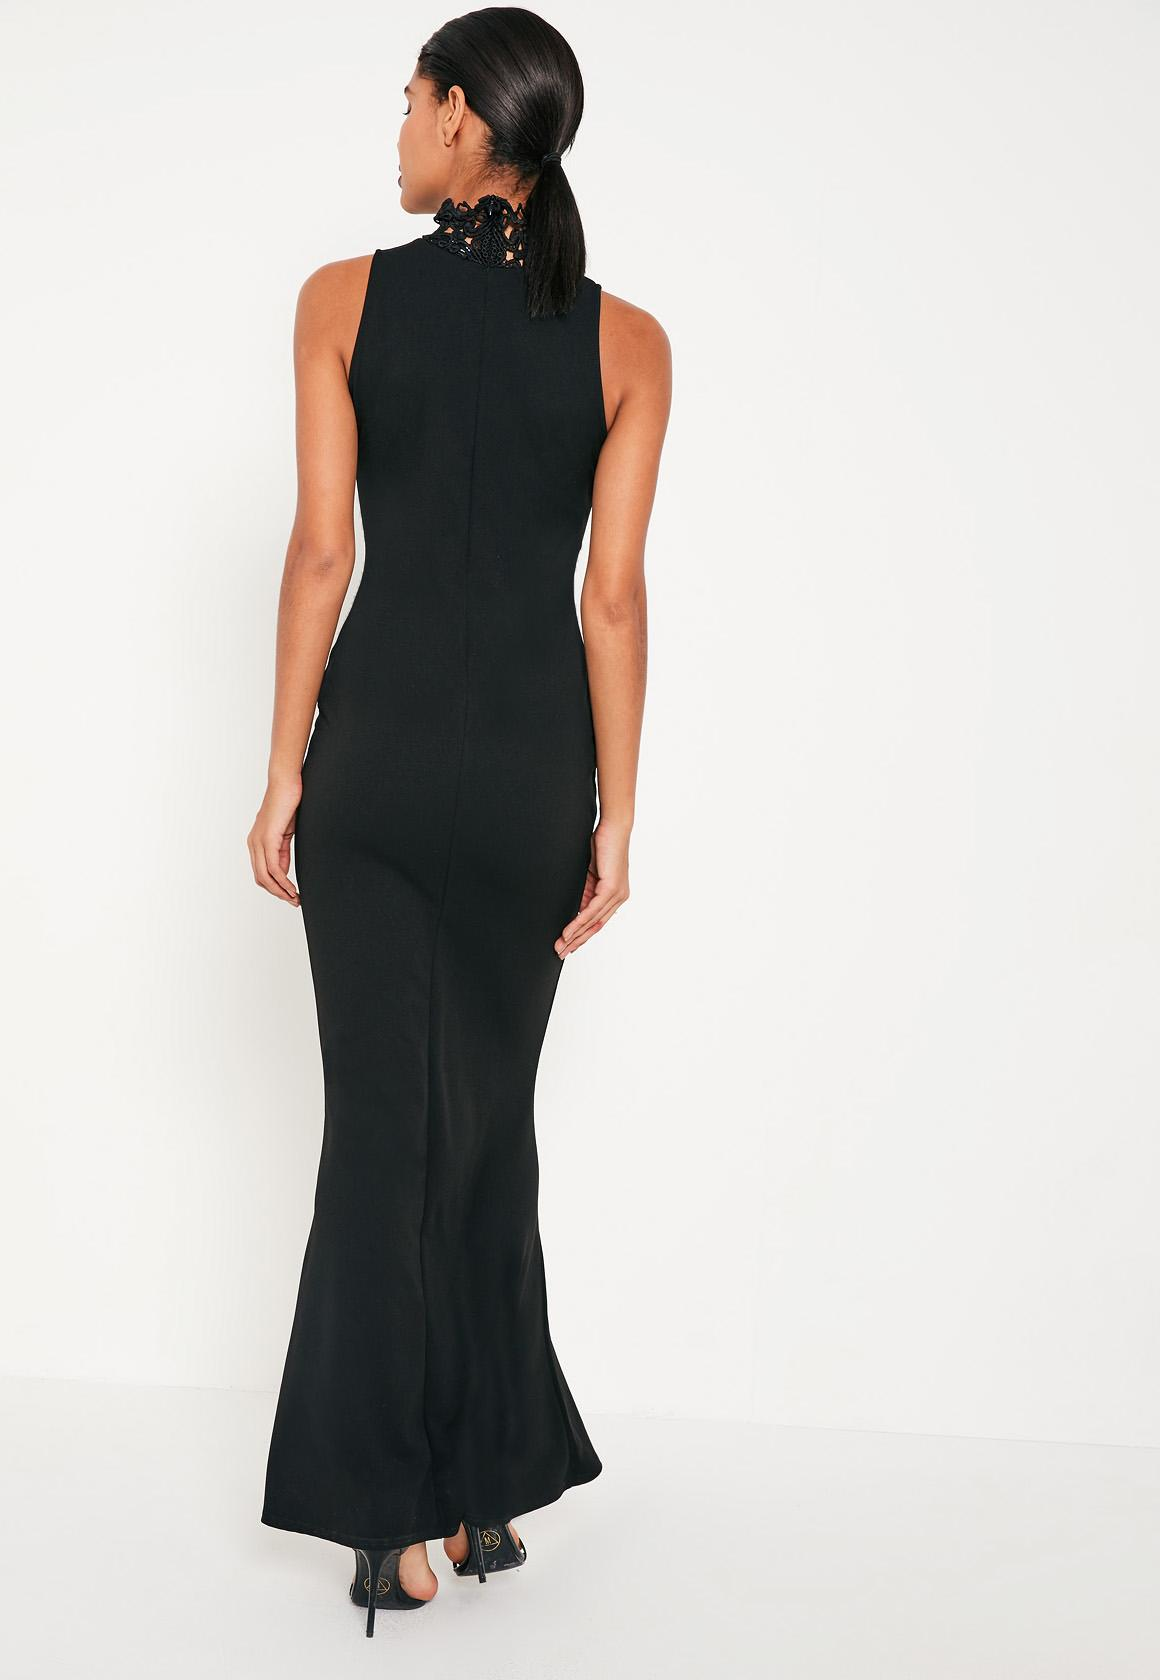 Black Crepe Neck Lace Maxi Dress